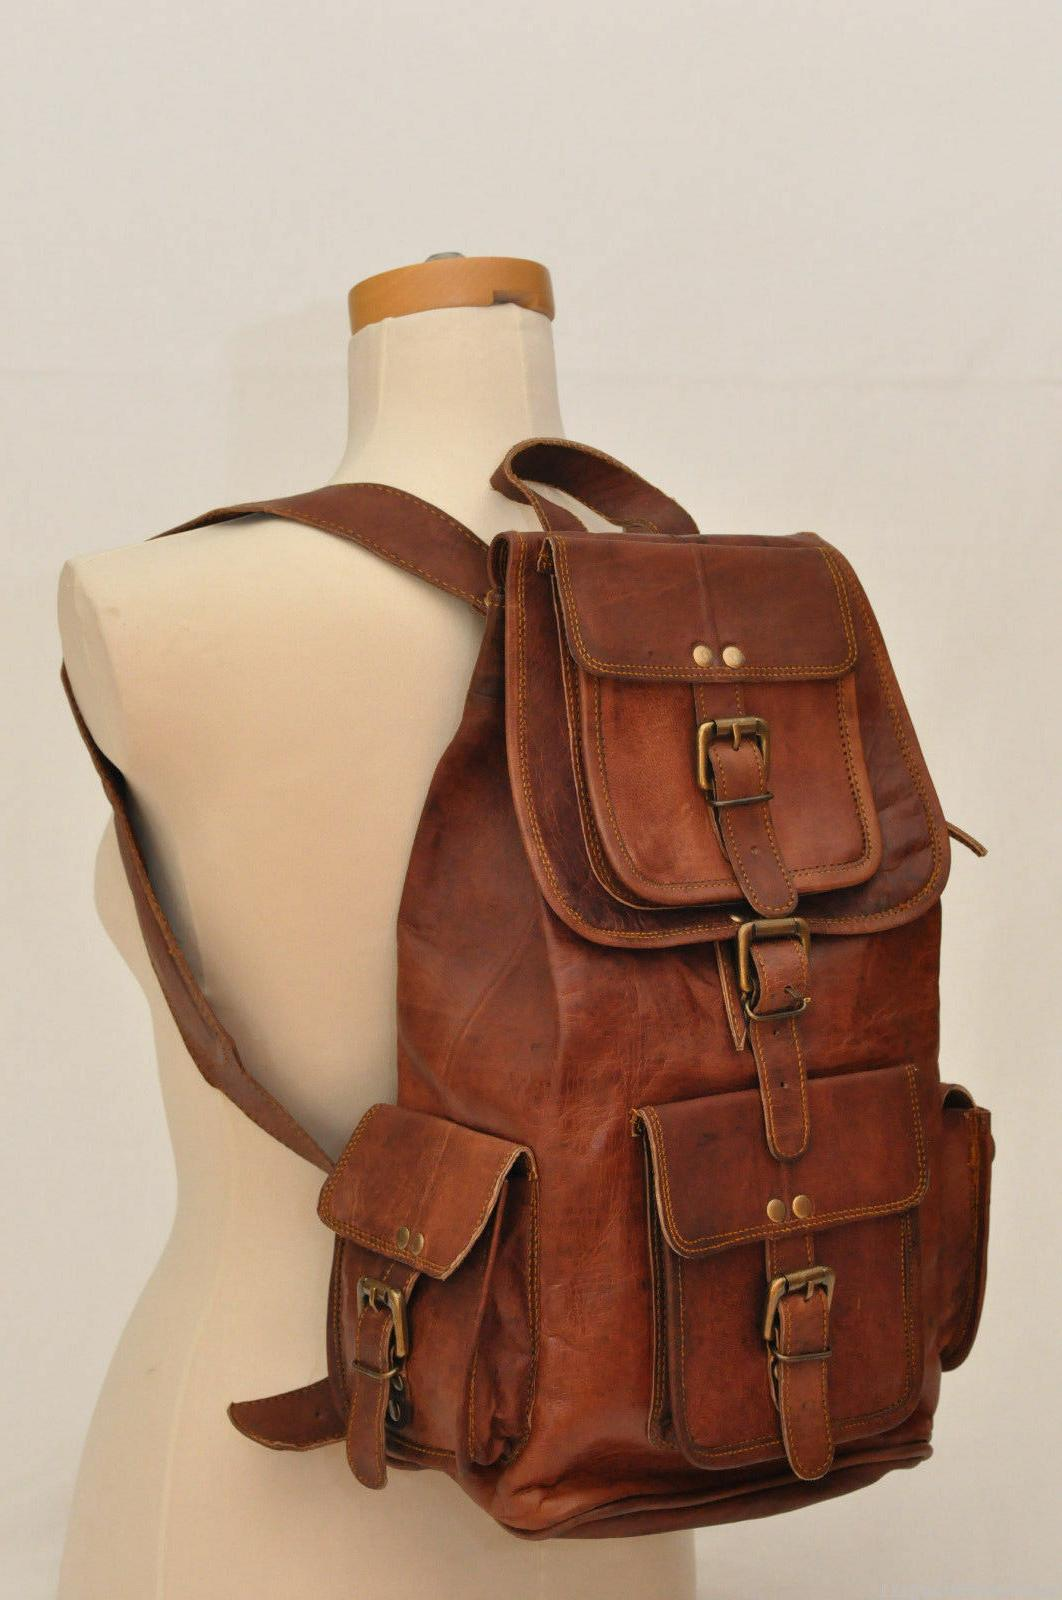 HIGH QUALITY Backpack GENUINE VINTAGE LEATHER Rucksack Messe